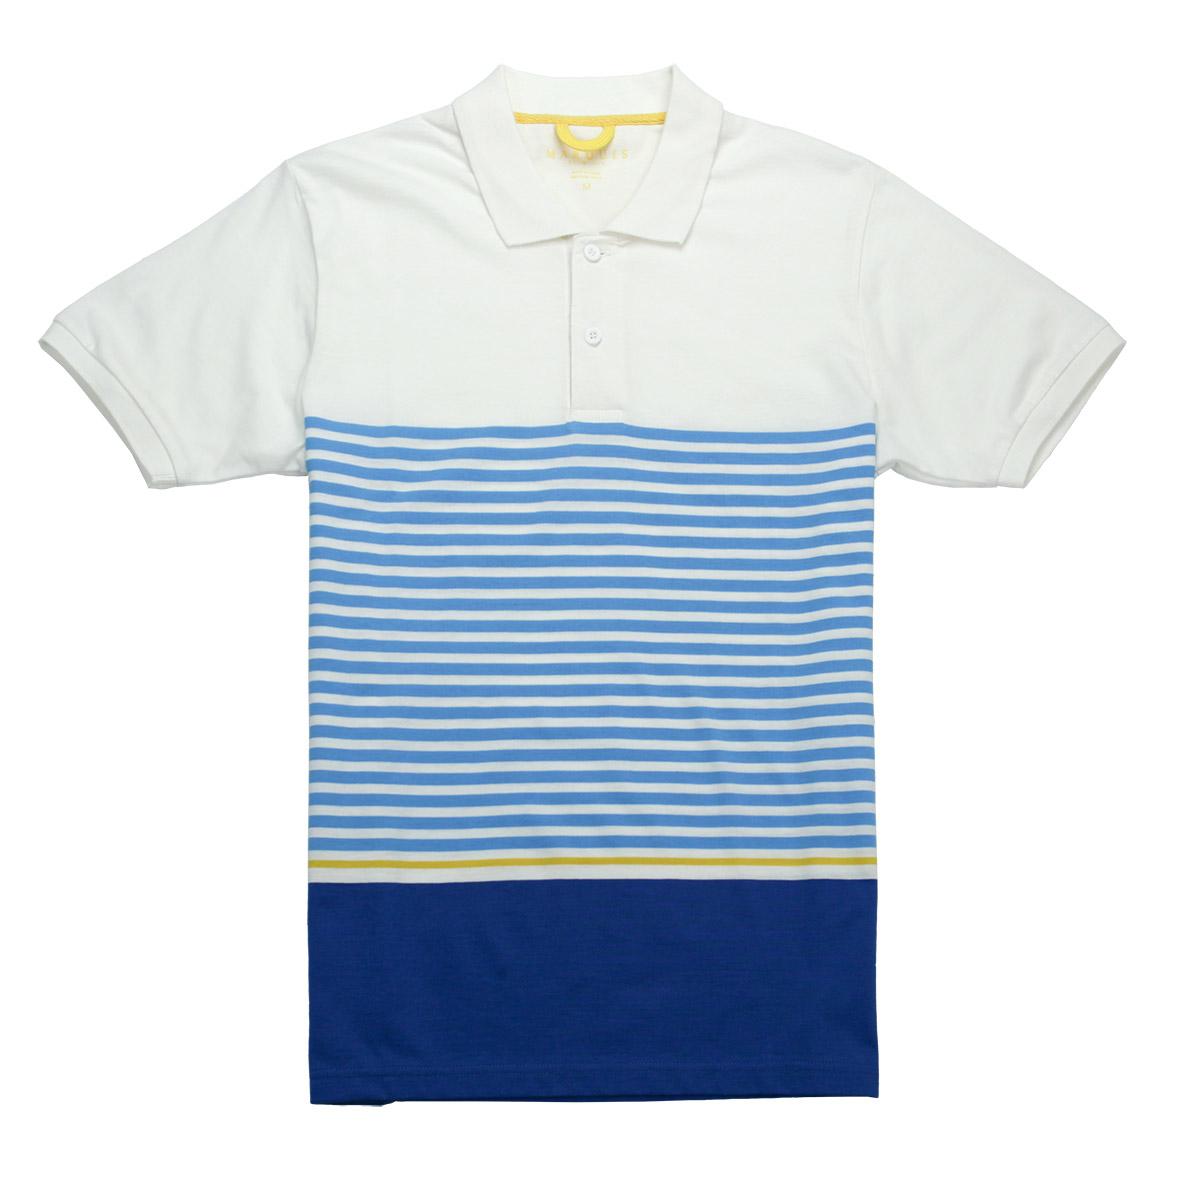 15353 SL - Blue